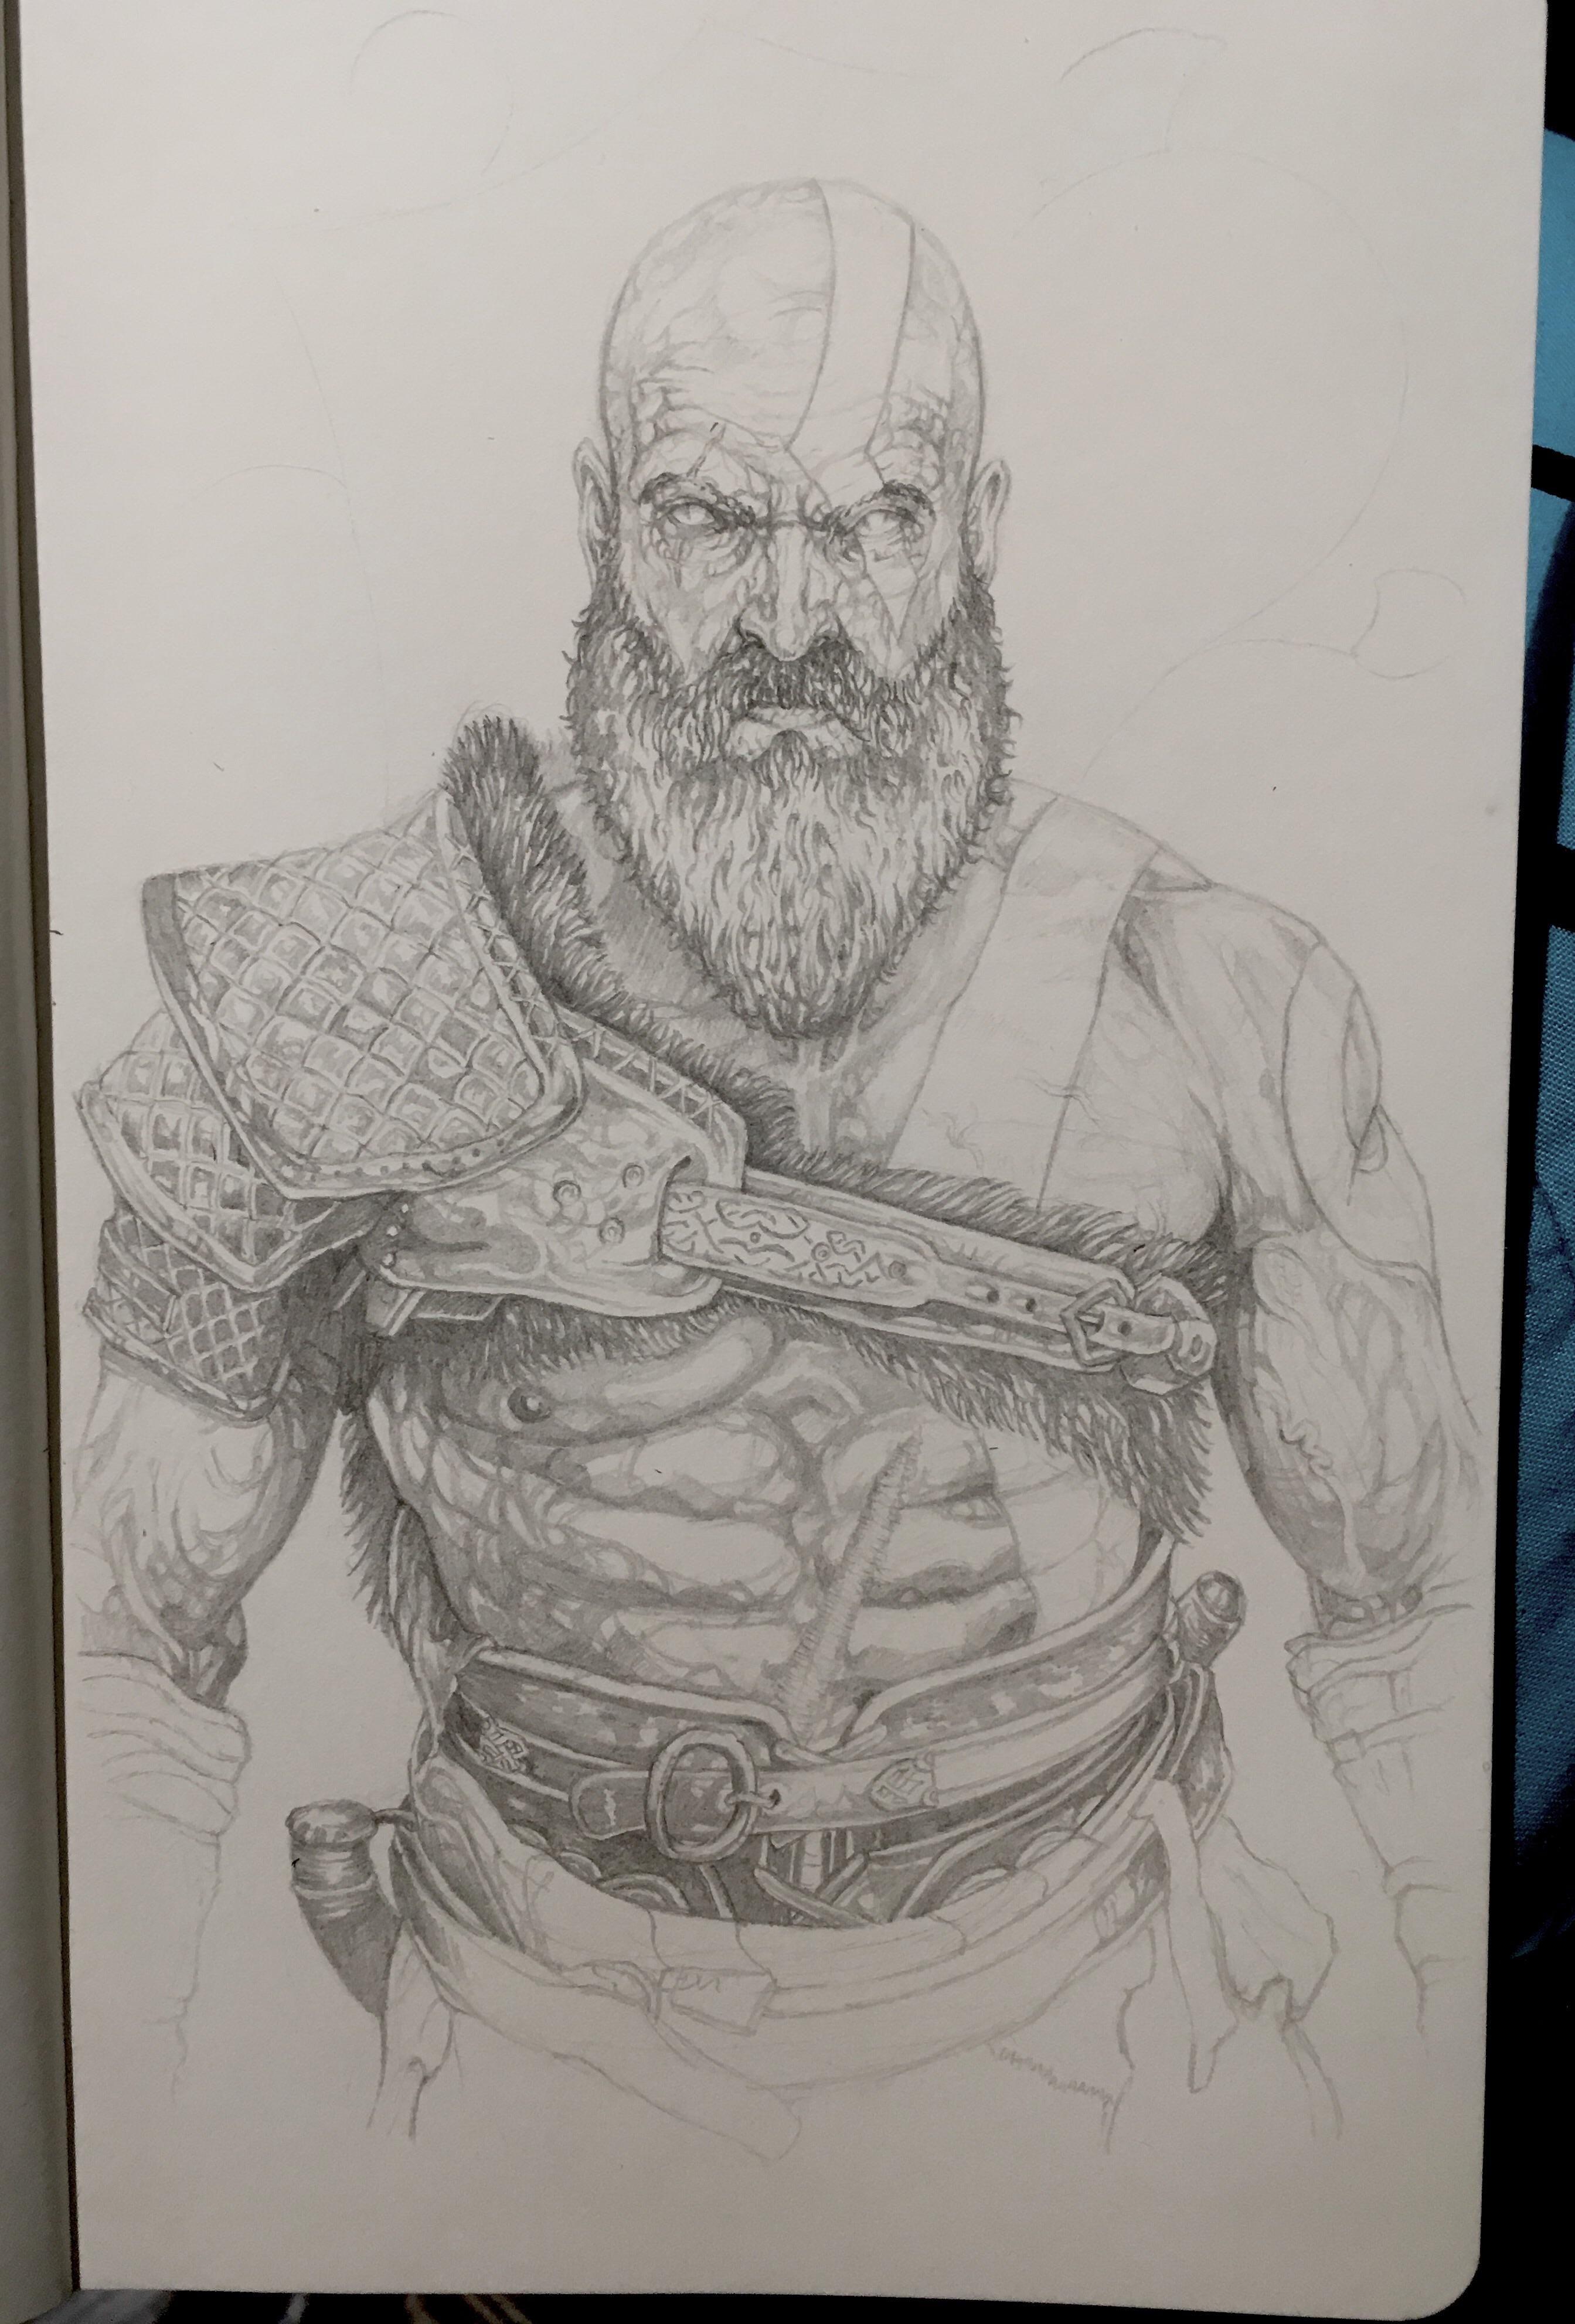 2687x3966 Kratos From The Upcoming God Of War. Gaming Gaming